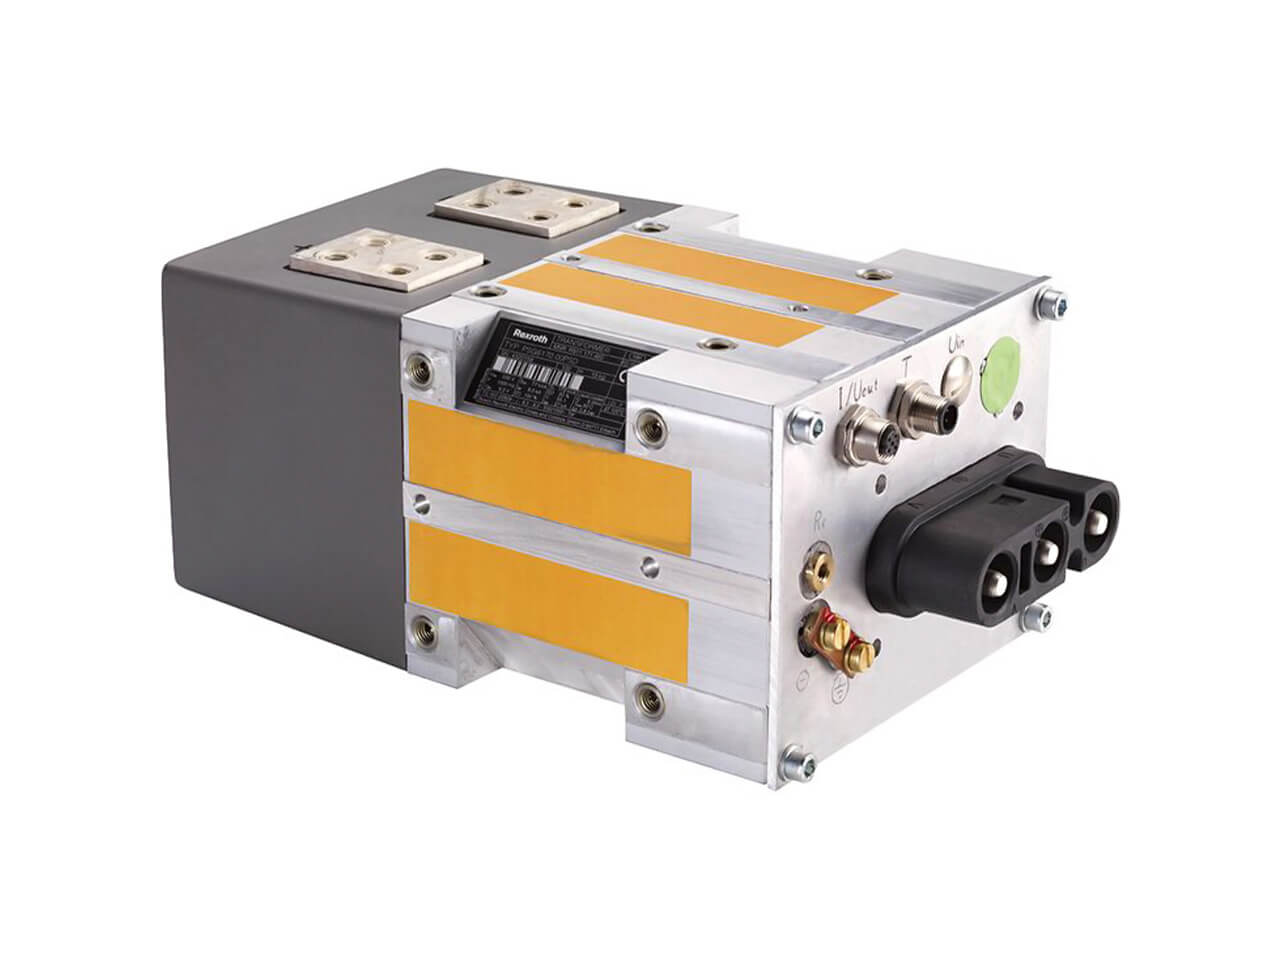 Medium Frequency Welding Transformer – PSG 6170.00 ASTK